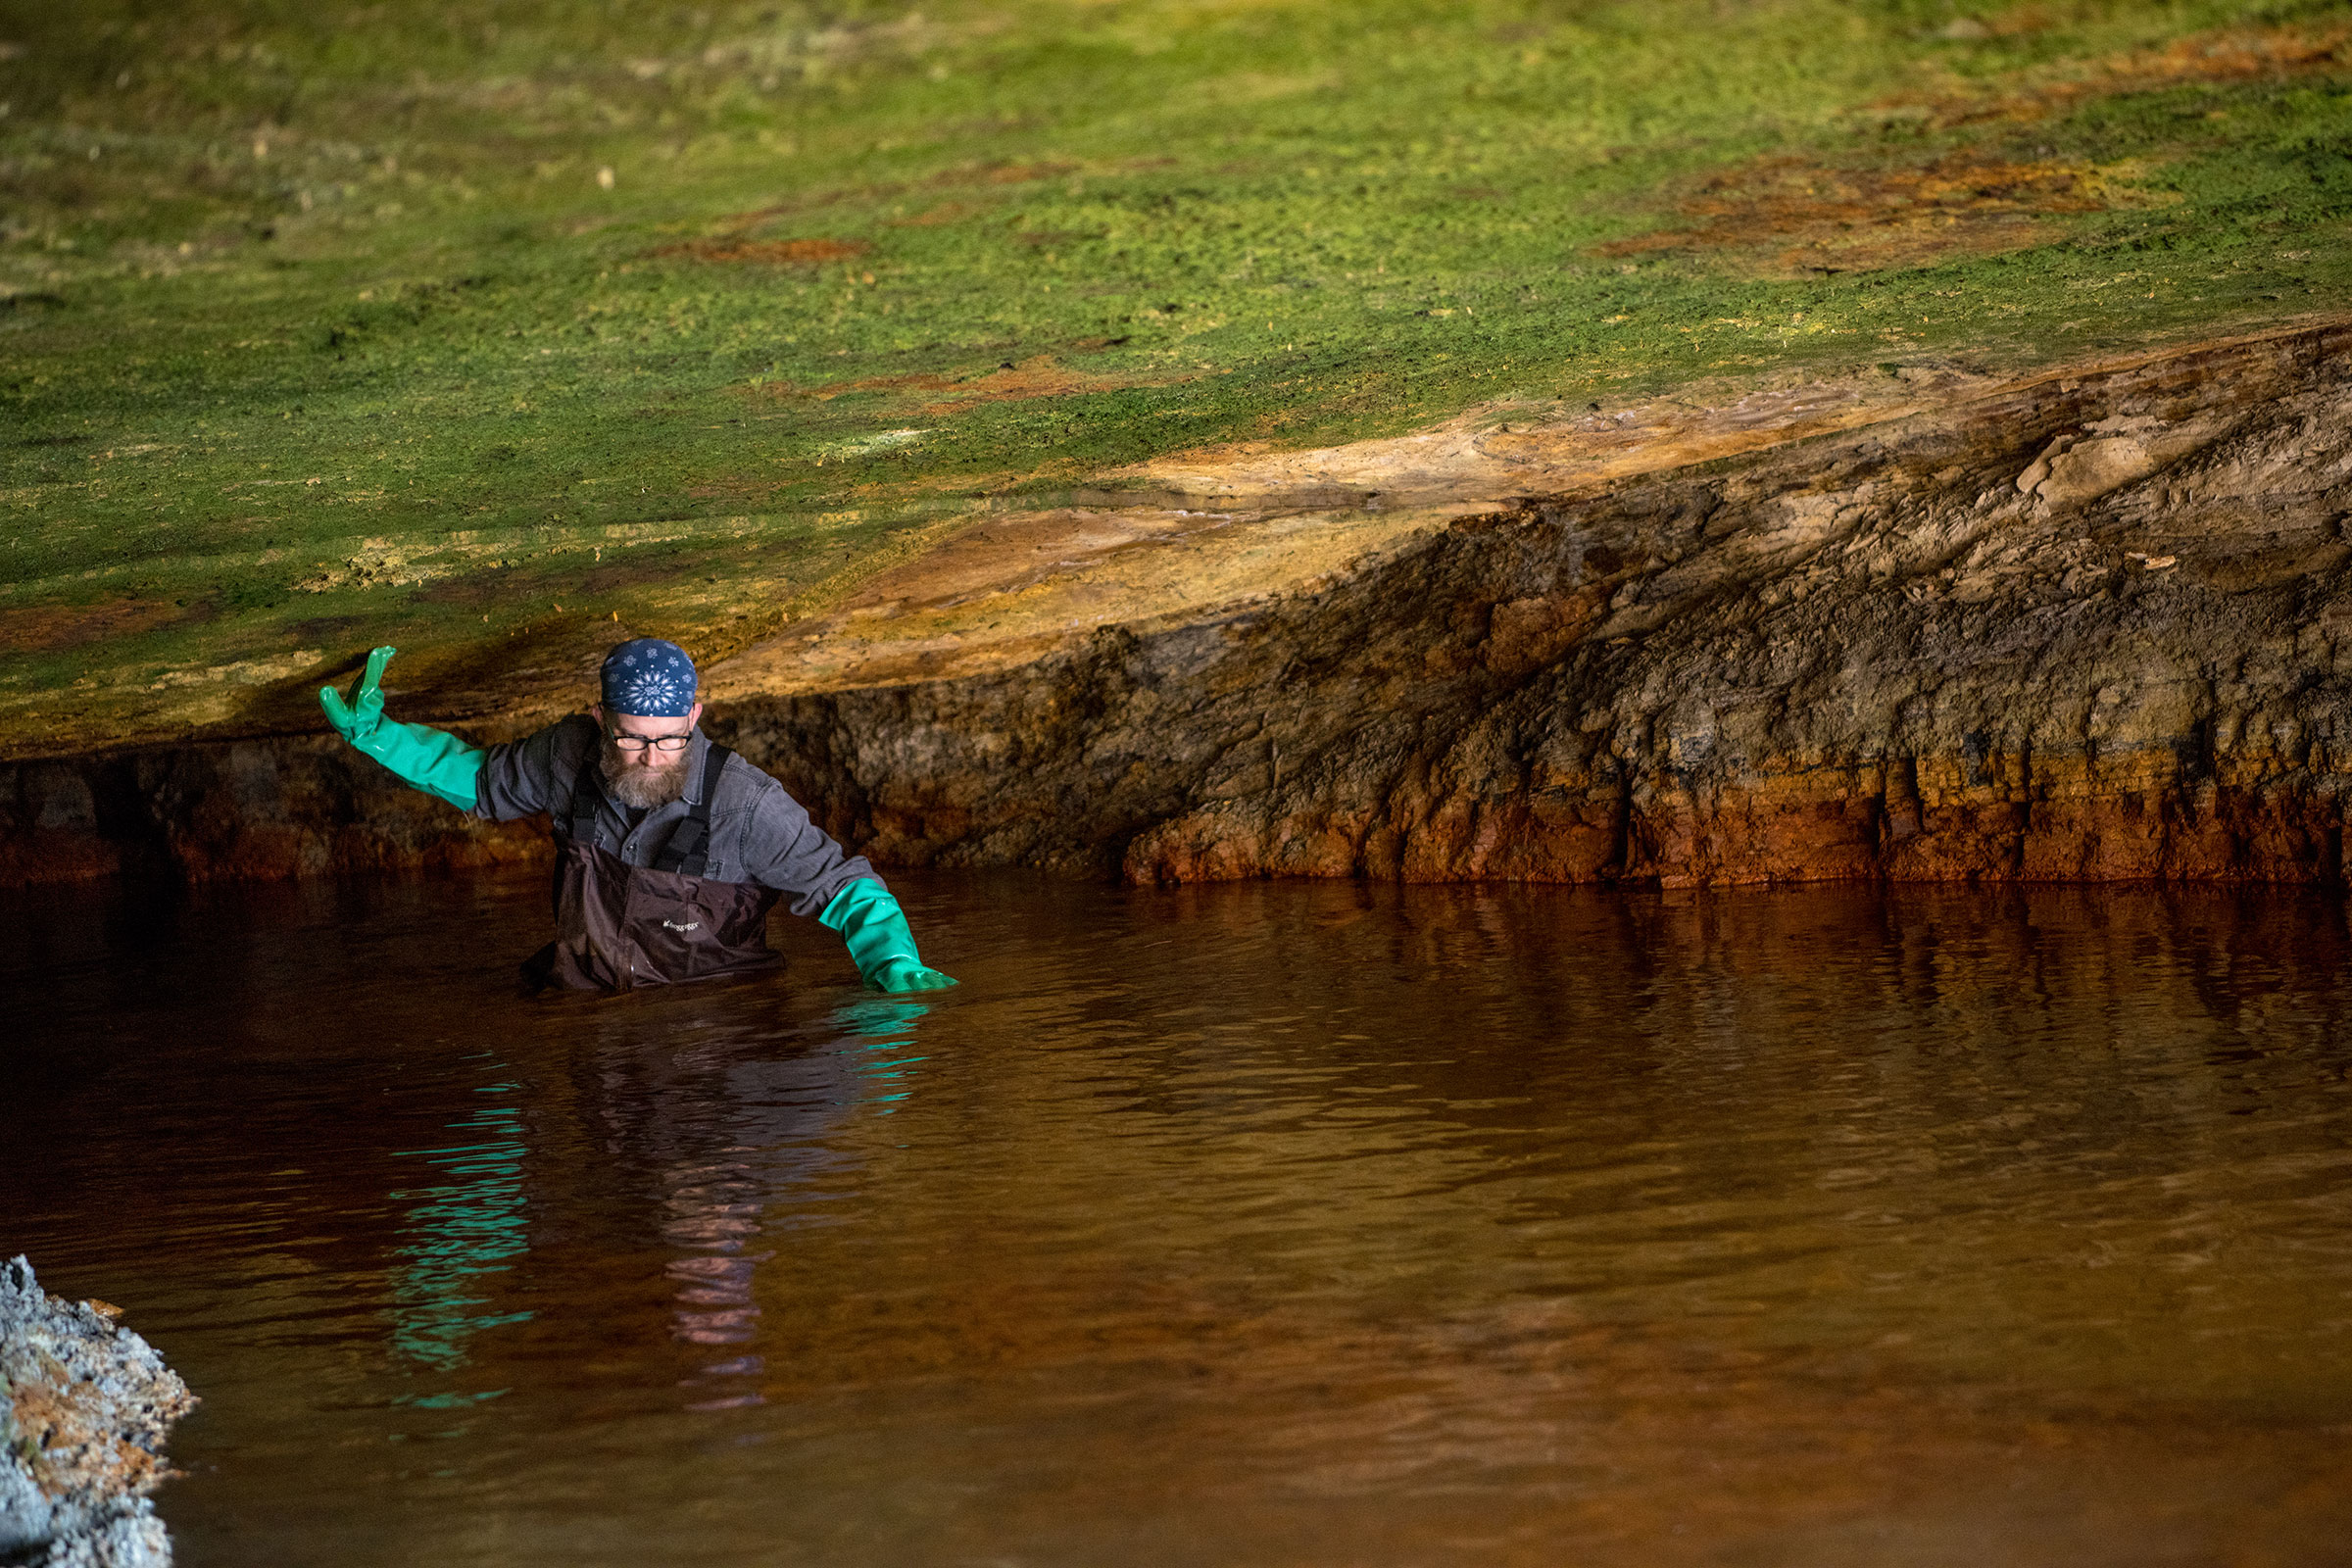 John Sabraw deep in acid mine drainage in Bat Gate cave, Sulfur Springs Hollow, Ohio.